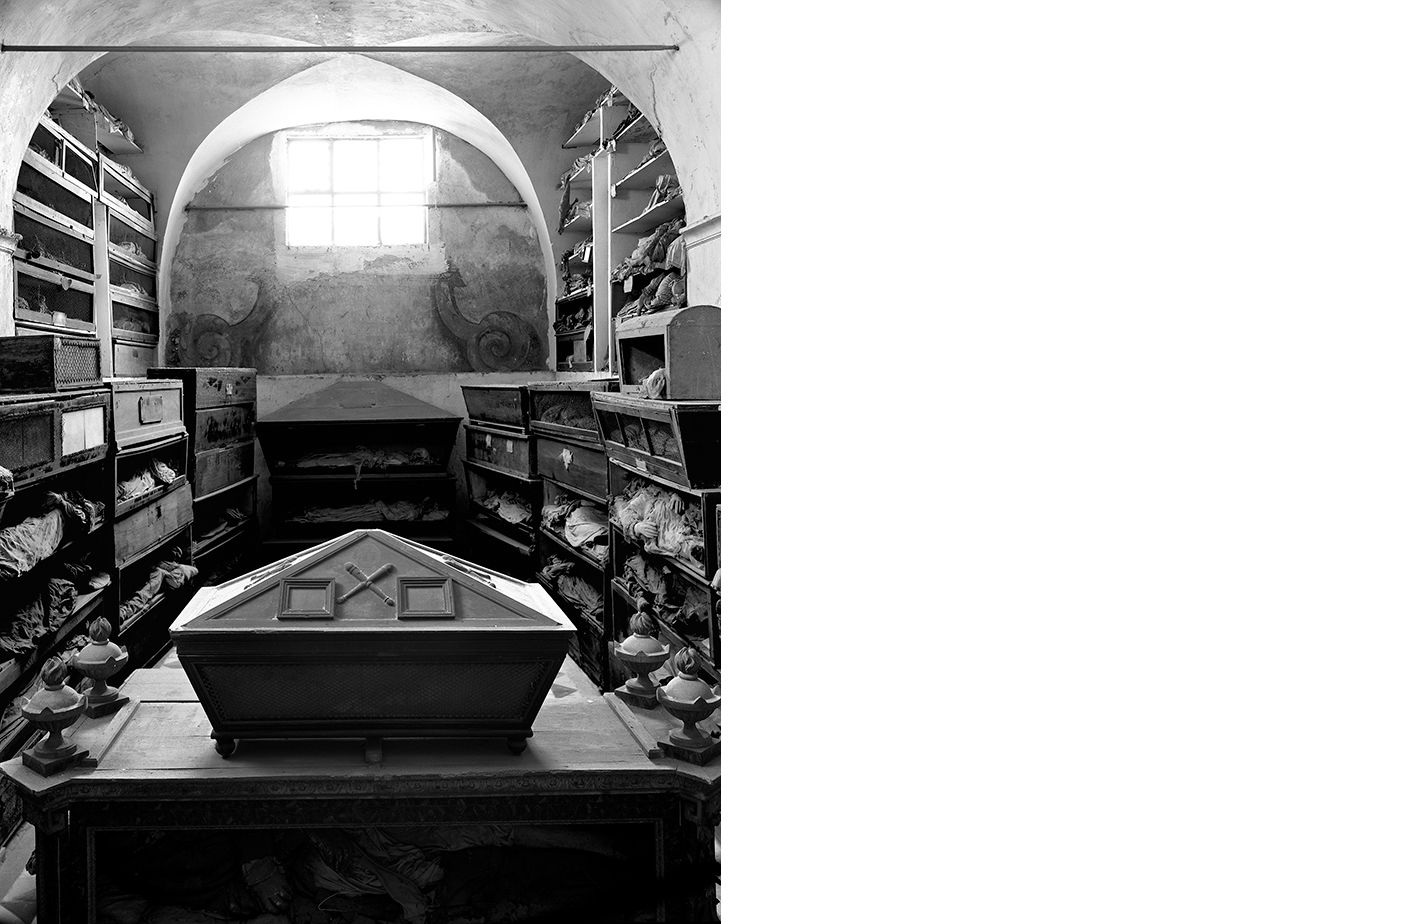 6416-01 Catacombe #40  Platinum Palladium Print 17.50 x22.00 inch Image Size 24.00 x 29.00 inch Paper Size 1 BAT / 4 AP / 24 EDP